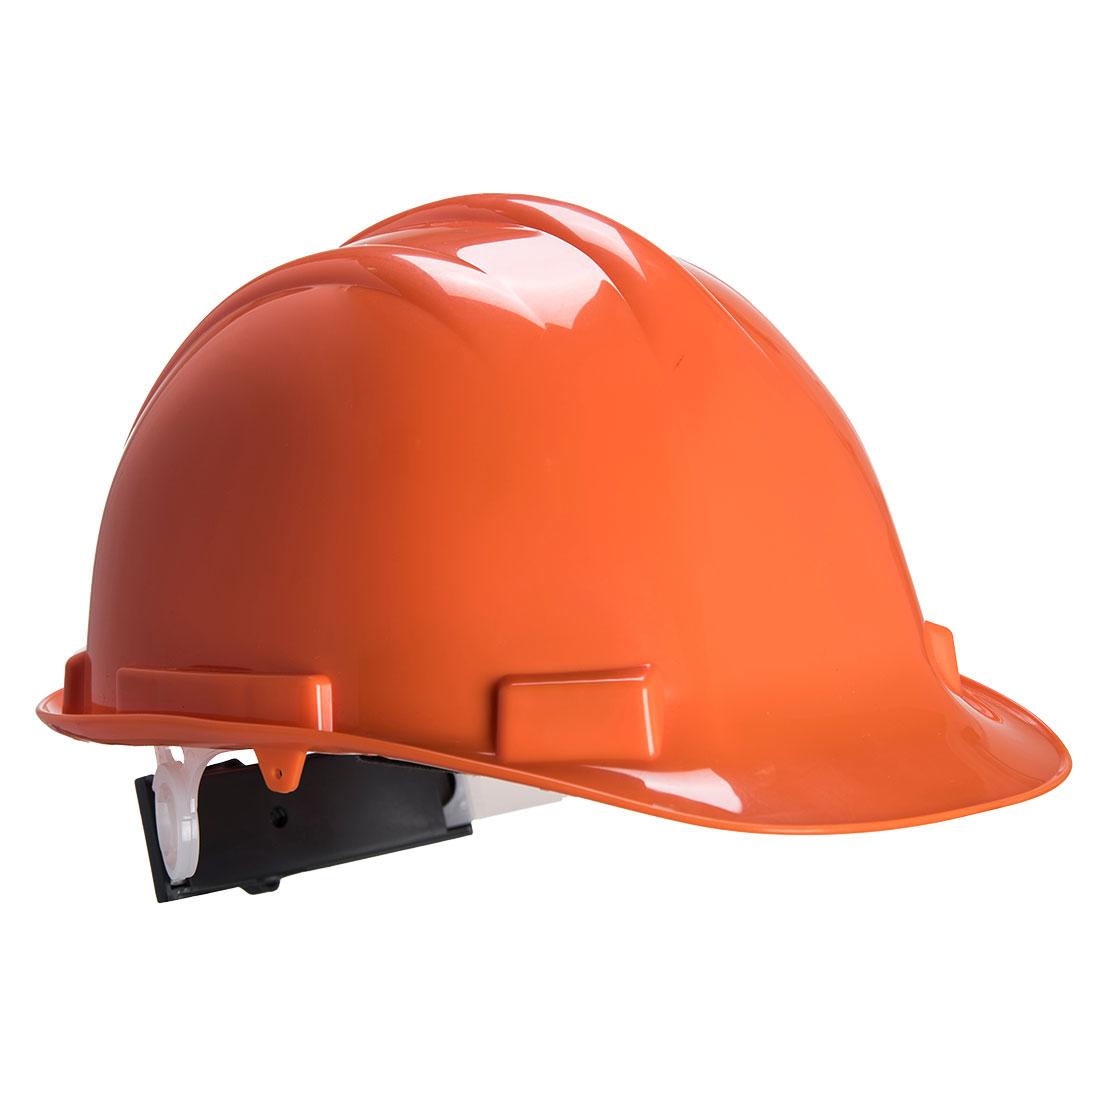 Expertbase Wheel Safety Helmet Orange